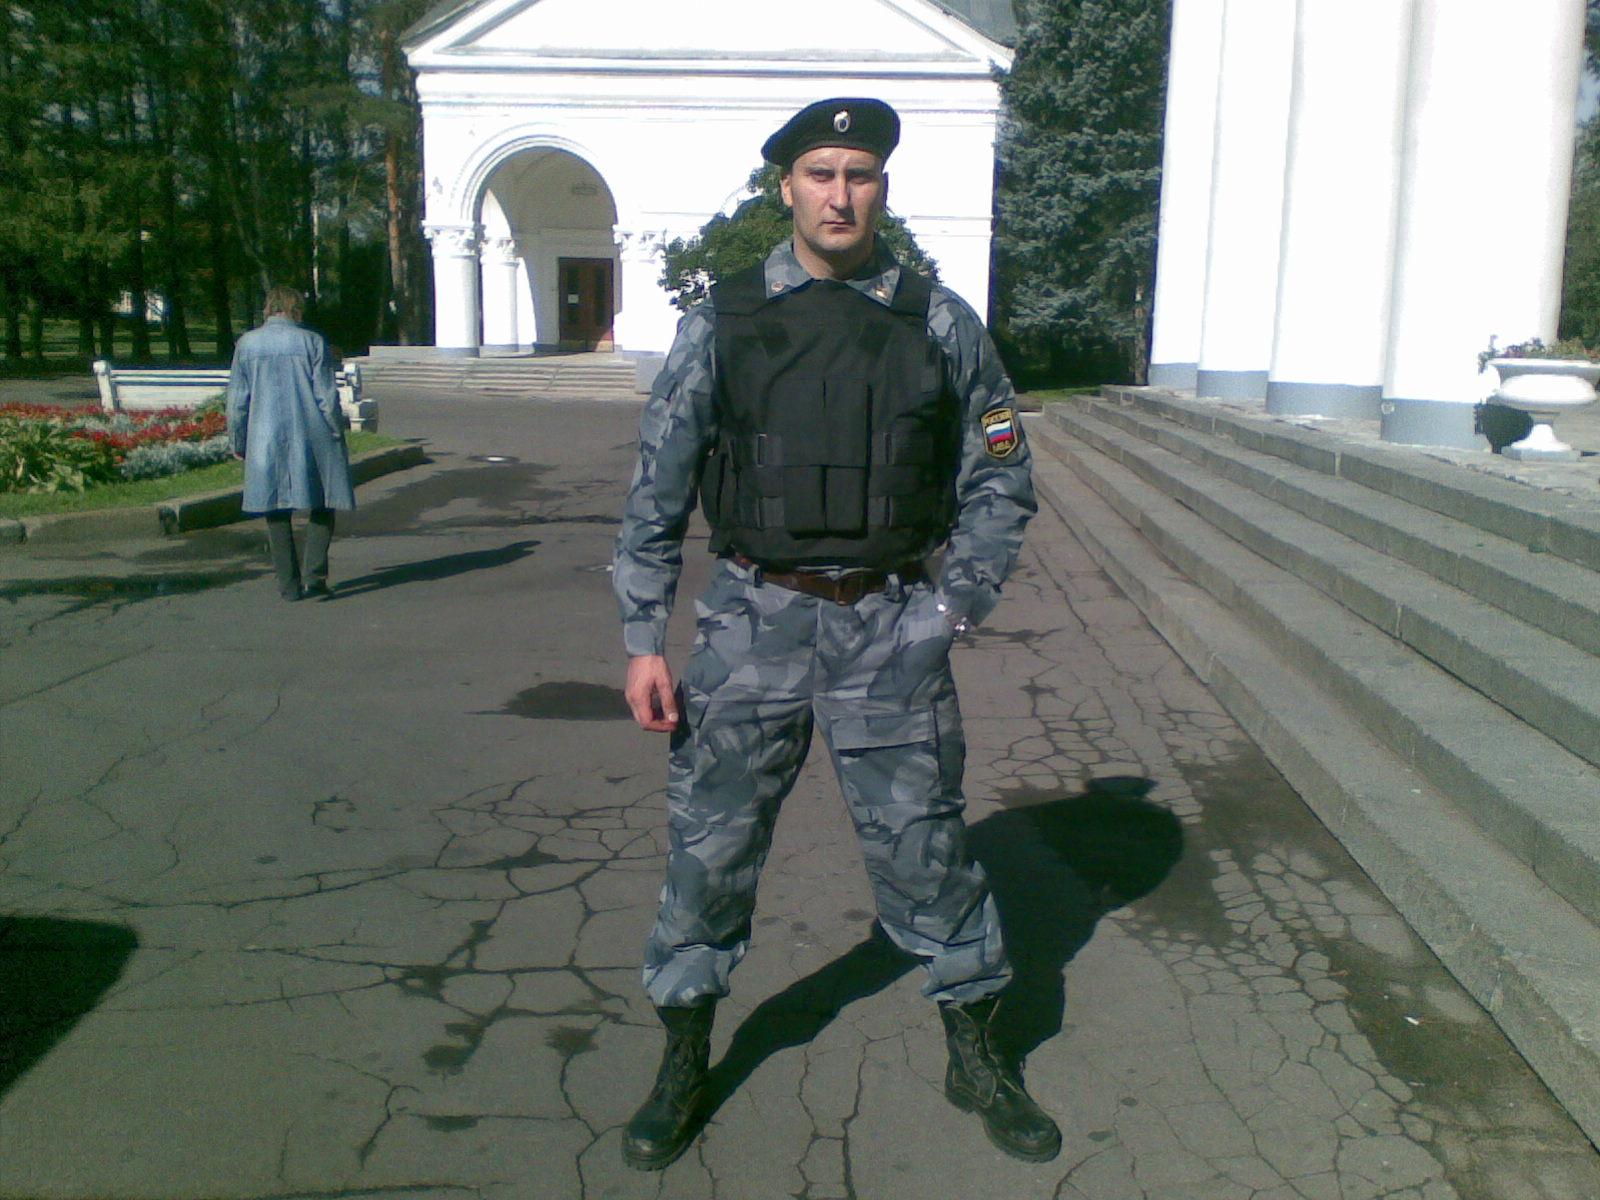 http://pmatsuk.narod.ru/1/images/100.jpg